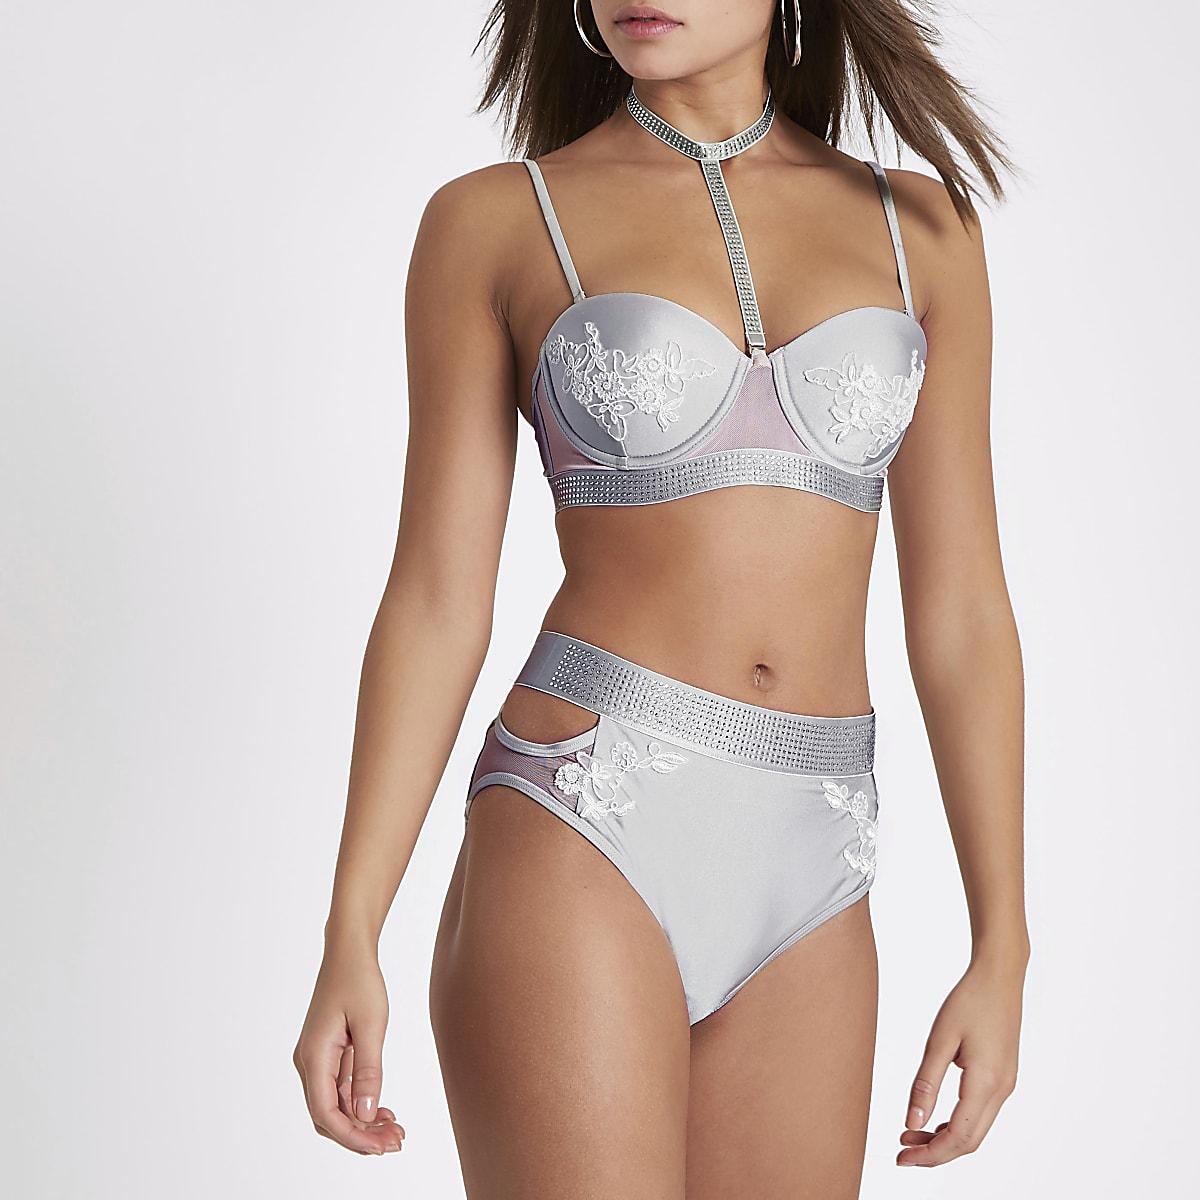 8d118acf27f5f Silver diamante high waisted bikini bottoms - Bikini Bottoms - Bikinis -  Swimwear & Beachwear - women